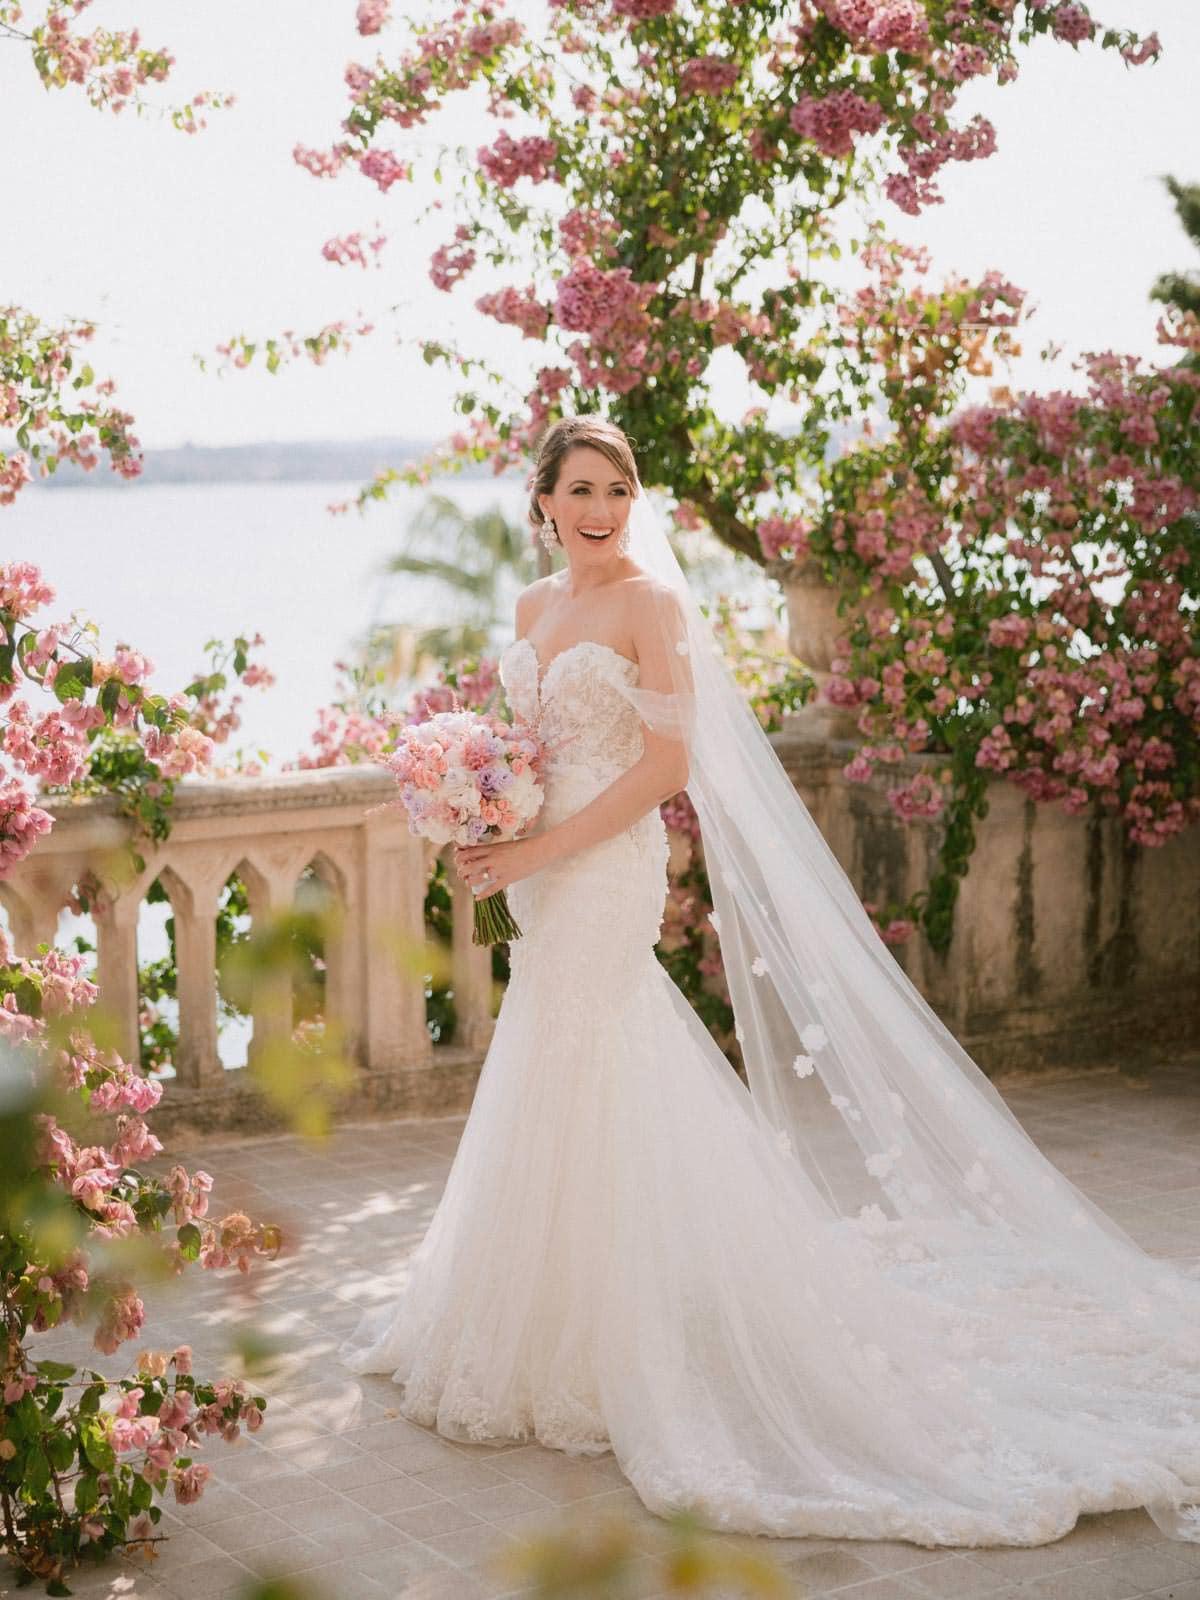 stunning bride portrait at Isola del garda